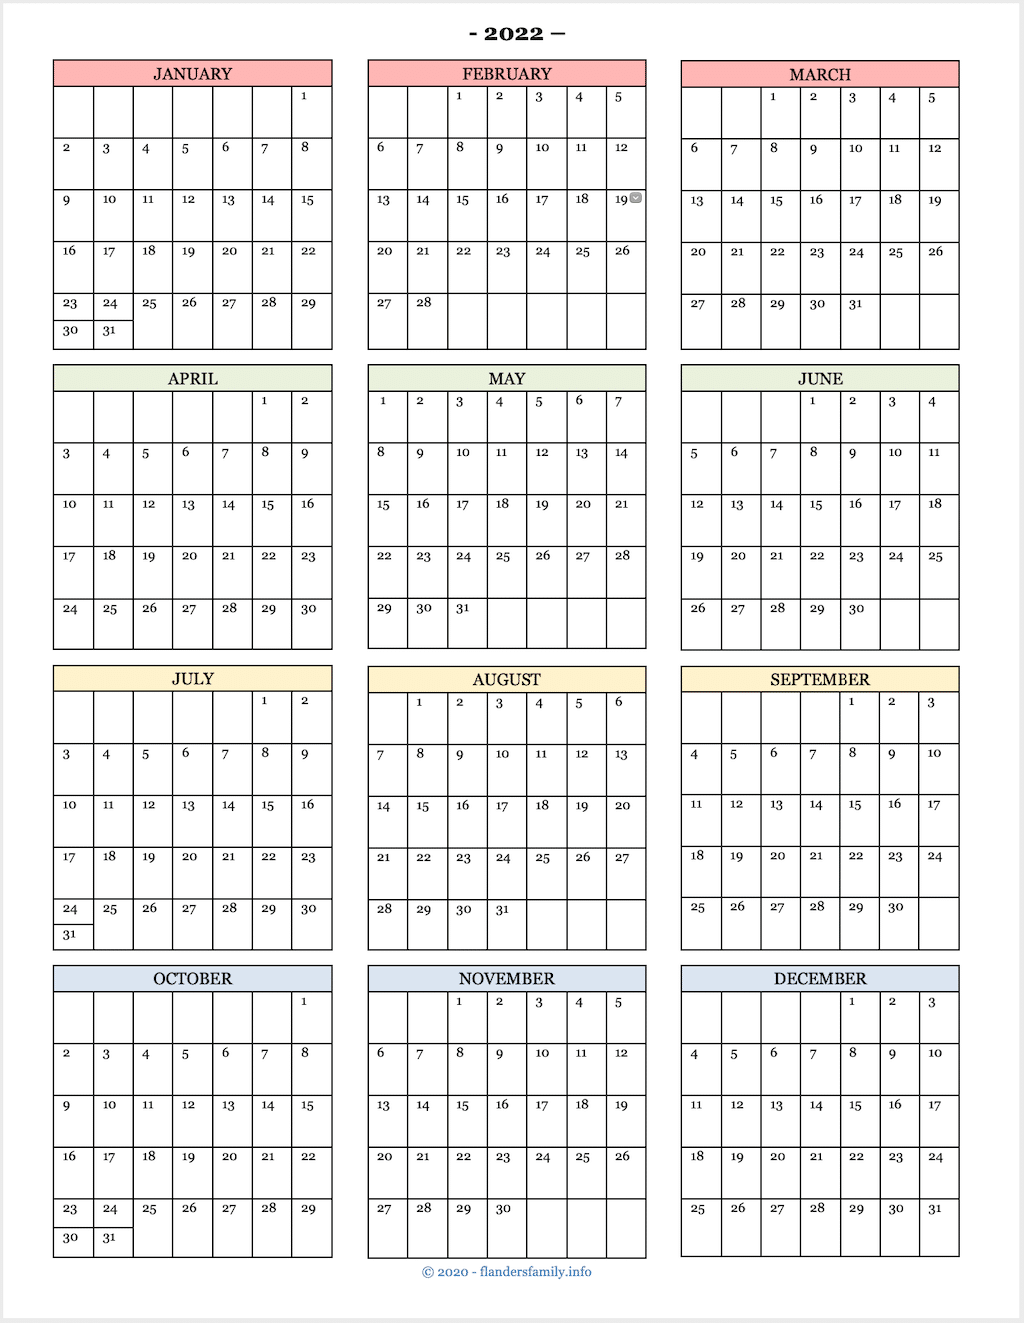 2022 Calendar At A Glance.2022 Calendars Free Printables Flanders Family Homelife